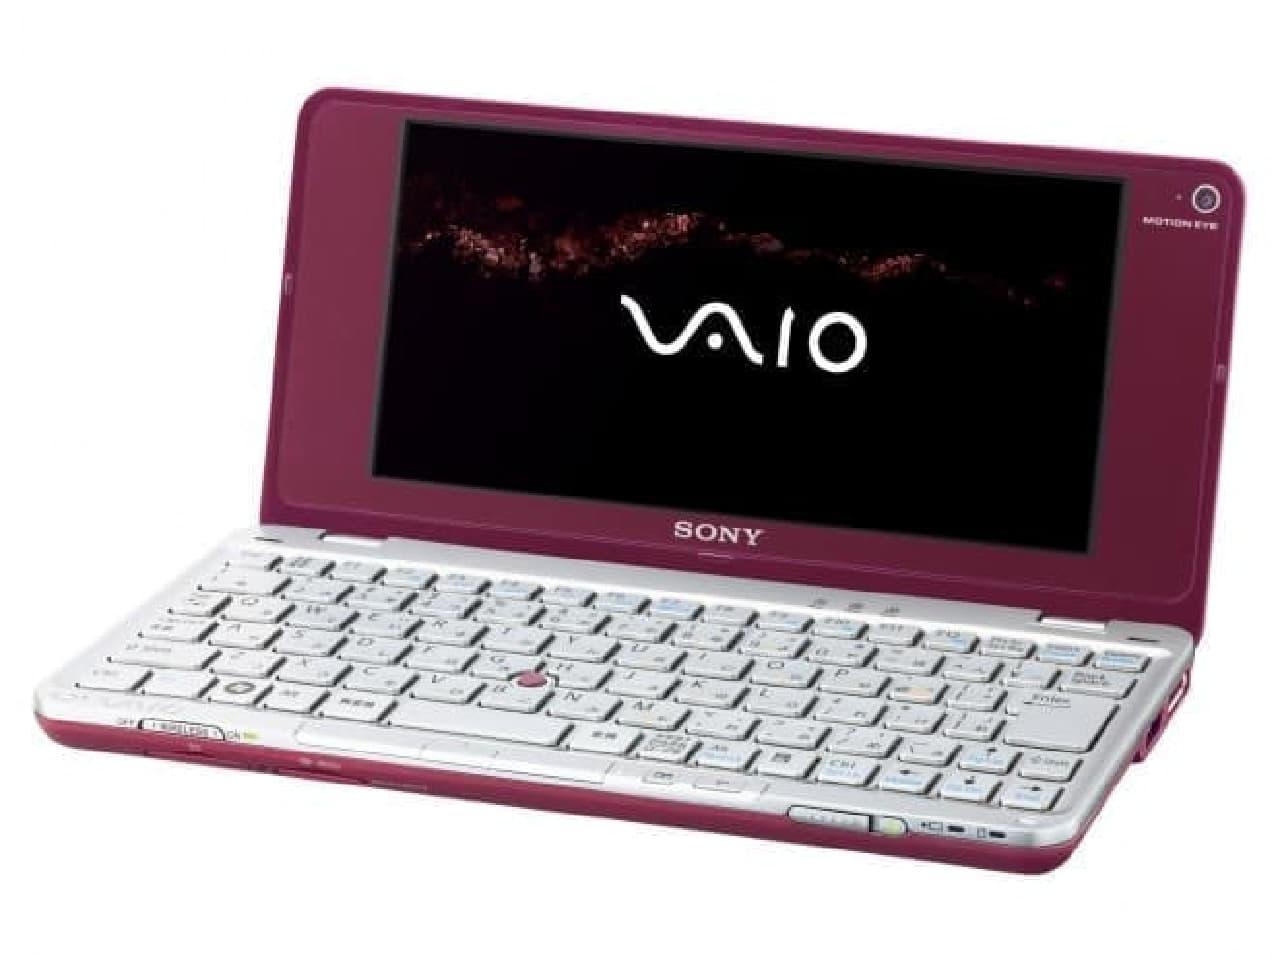 VAIO Type Pのイメージ